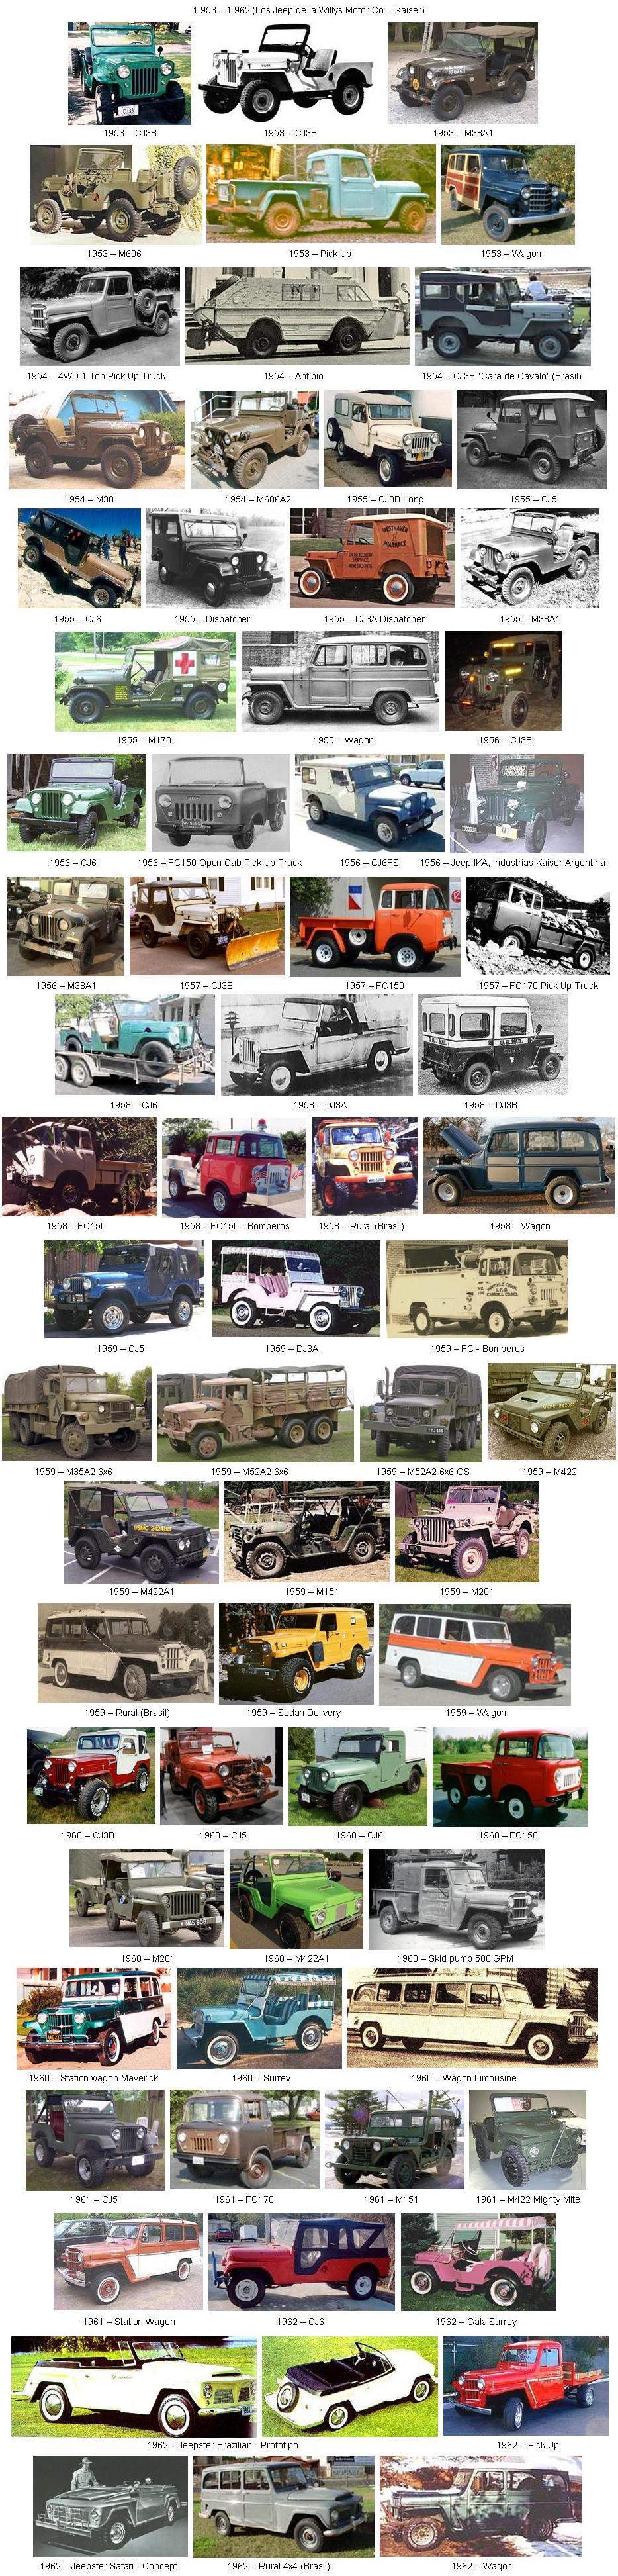 Historia Gráfica de la Jeep JEEP-03-(1953-1962)-(Willys%20Motor%20Co.%20-%20Kaiser)